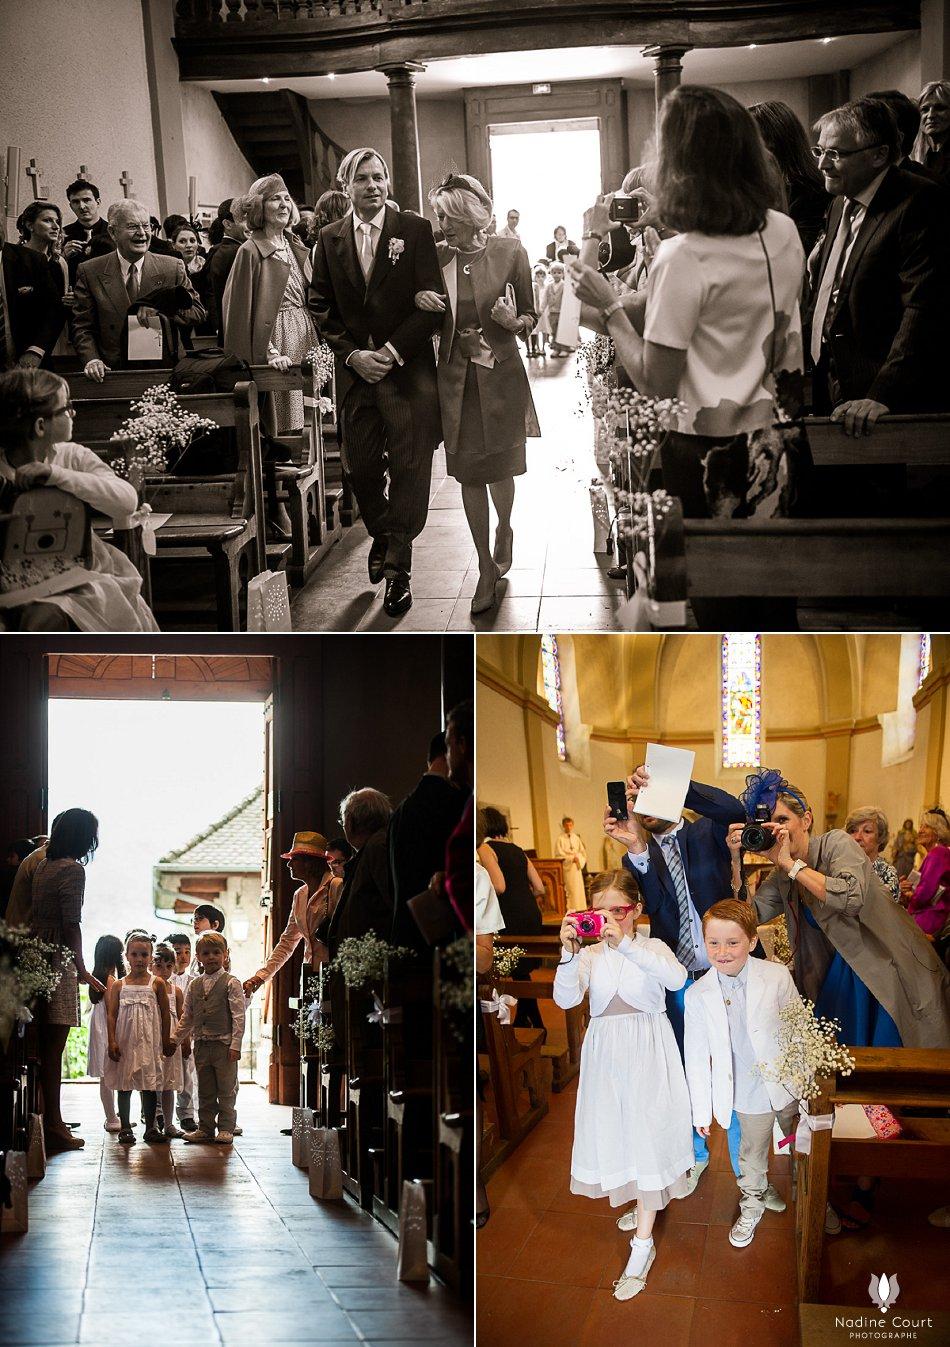 mariage labbaye de talloires crmonie religieuse - Abbaye De Talloires Mariage